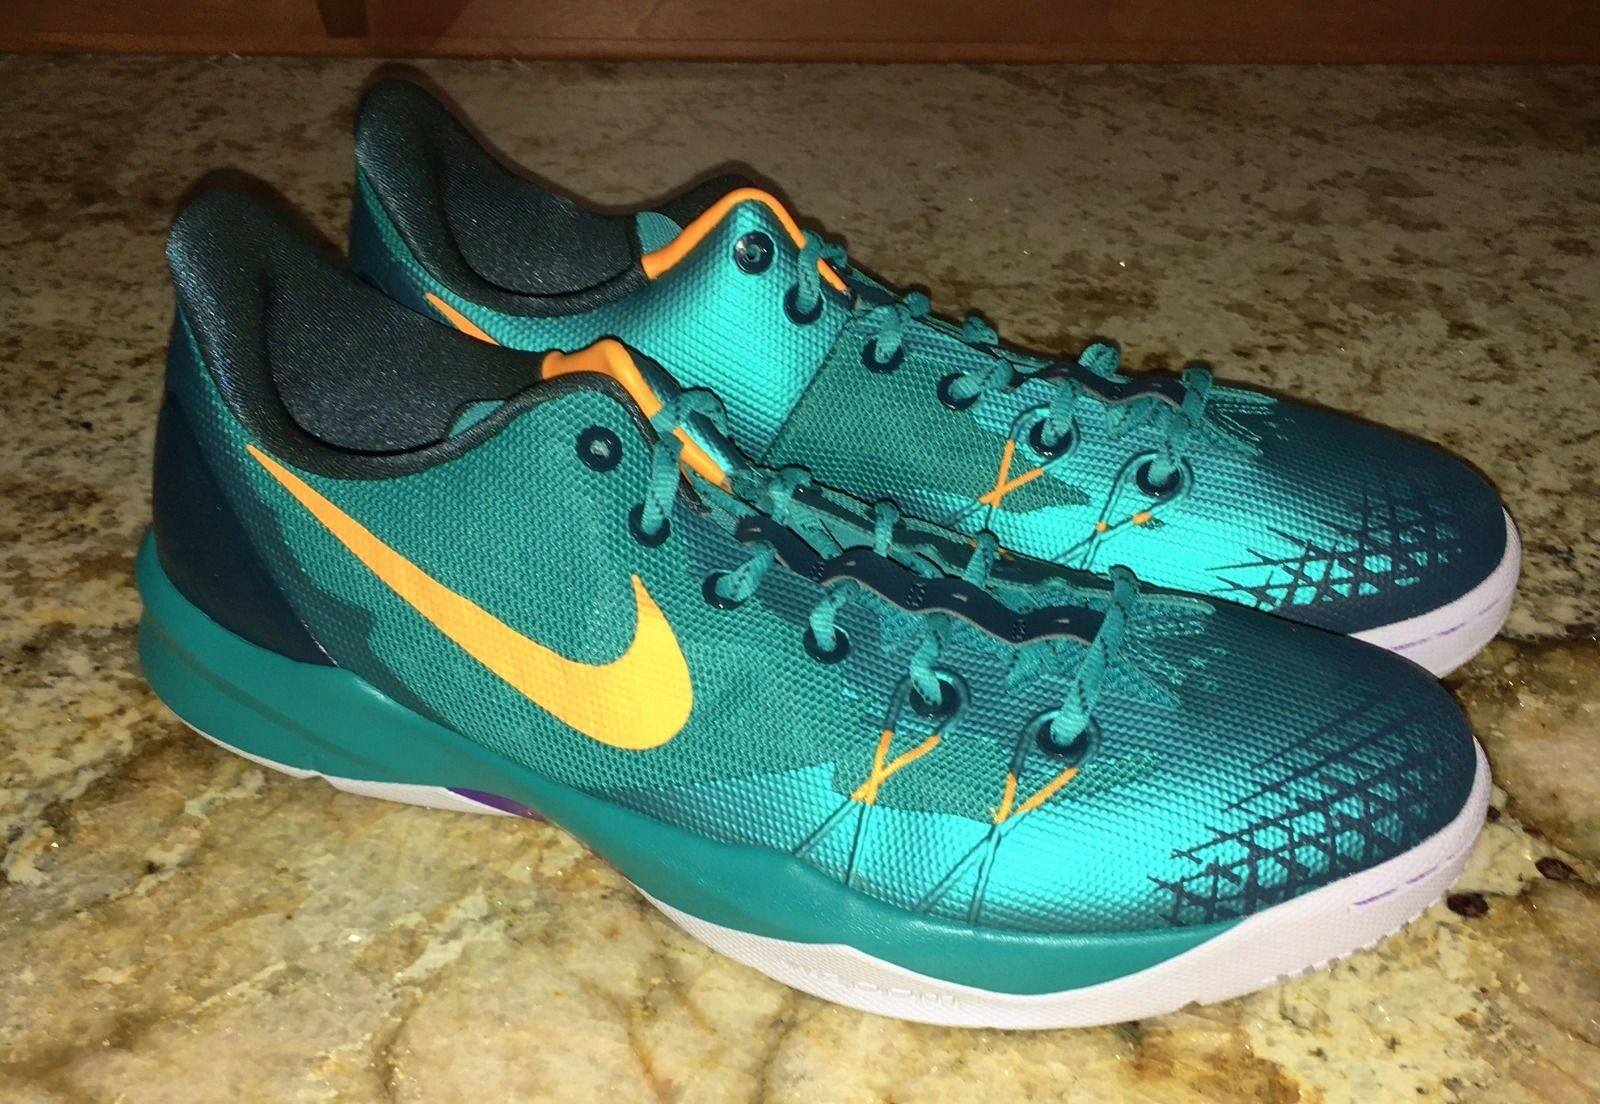 NIKE Kobe Venomenon 4 Low Turbo Green Basketball shoes Sneakers NEW Mens Sz 13